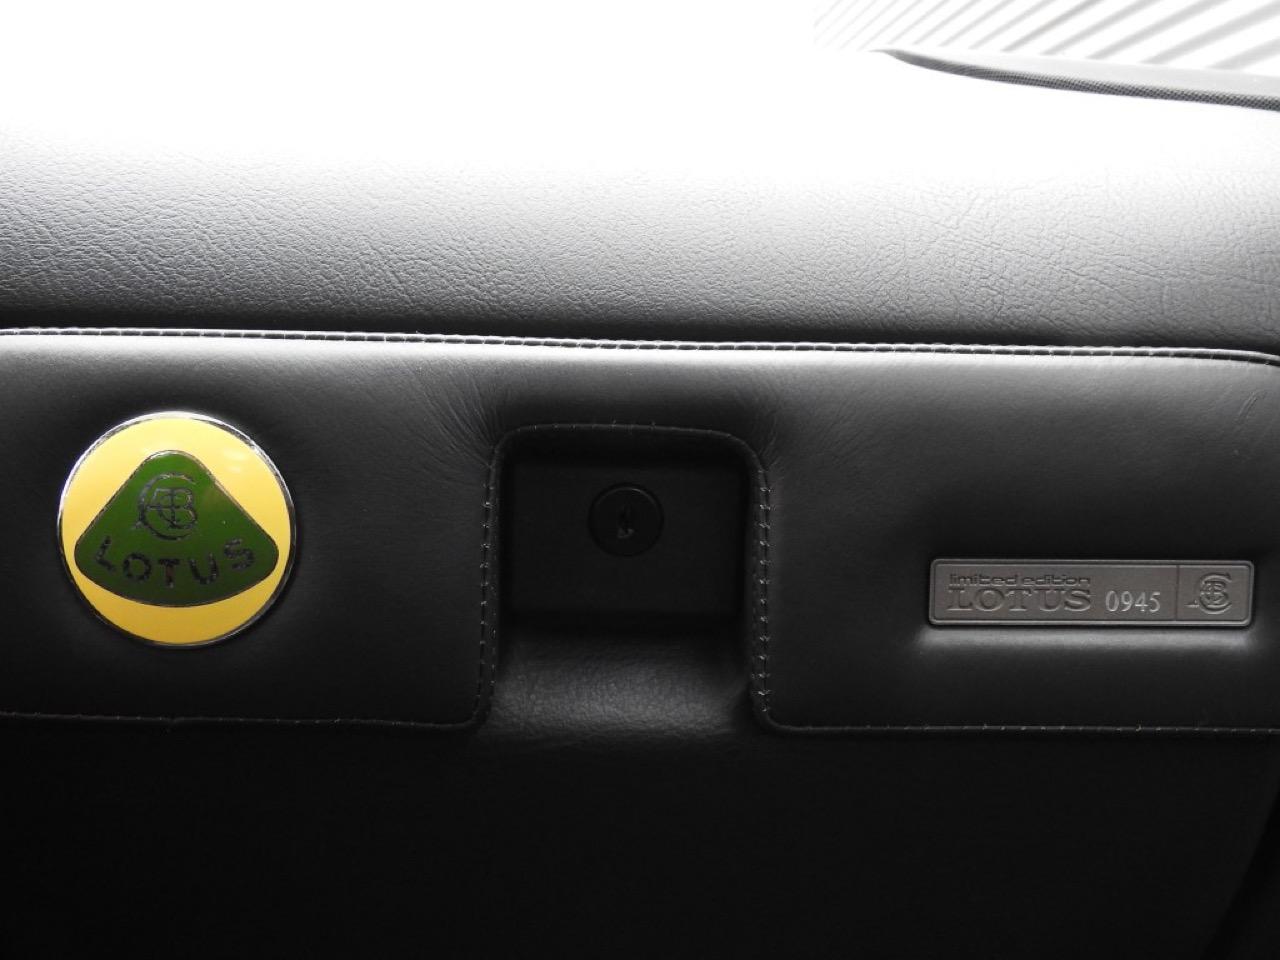 Opel Omega Lotus - Le monstre des 90's ! 46